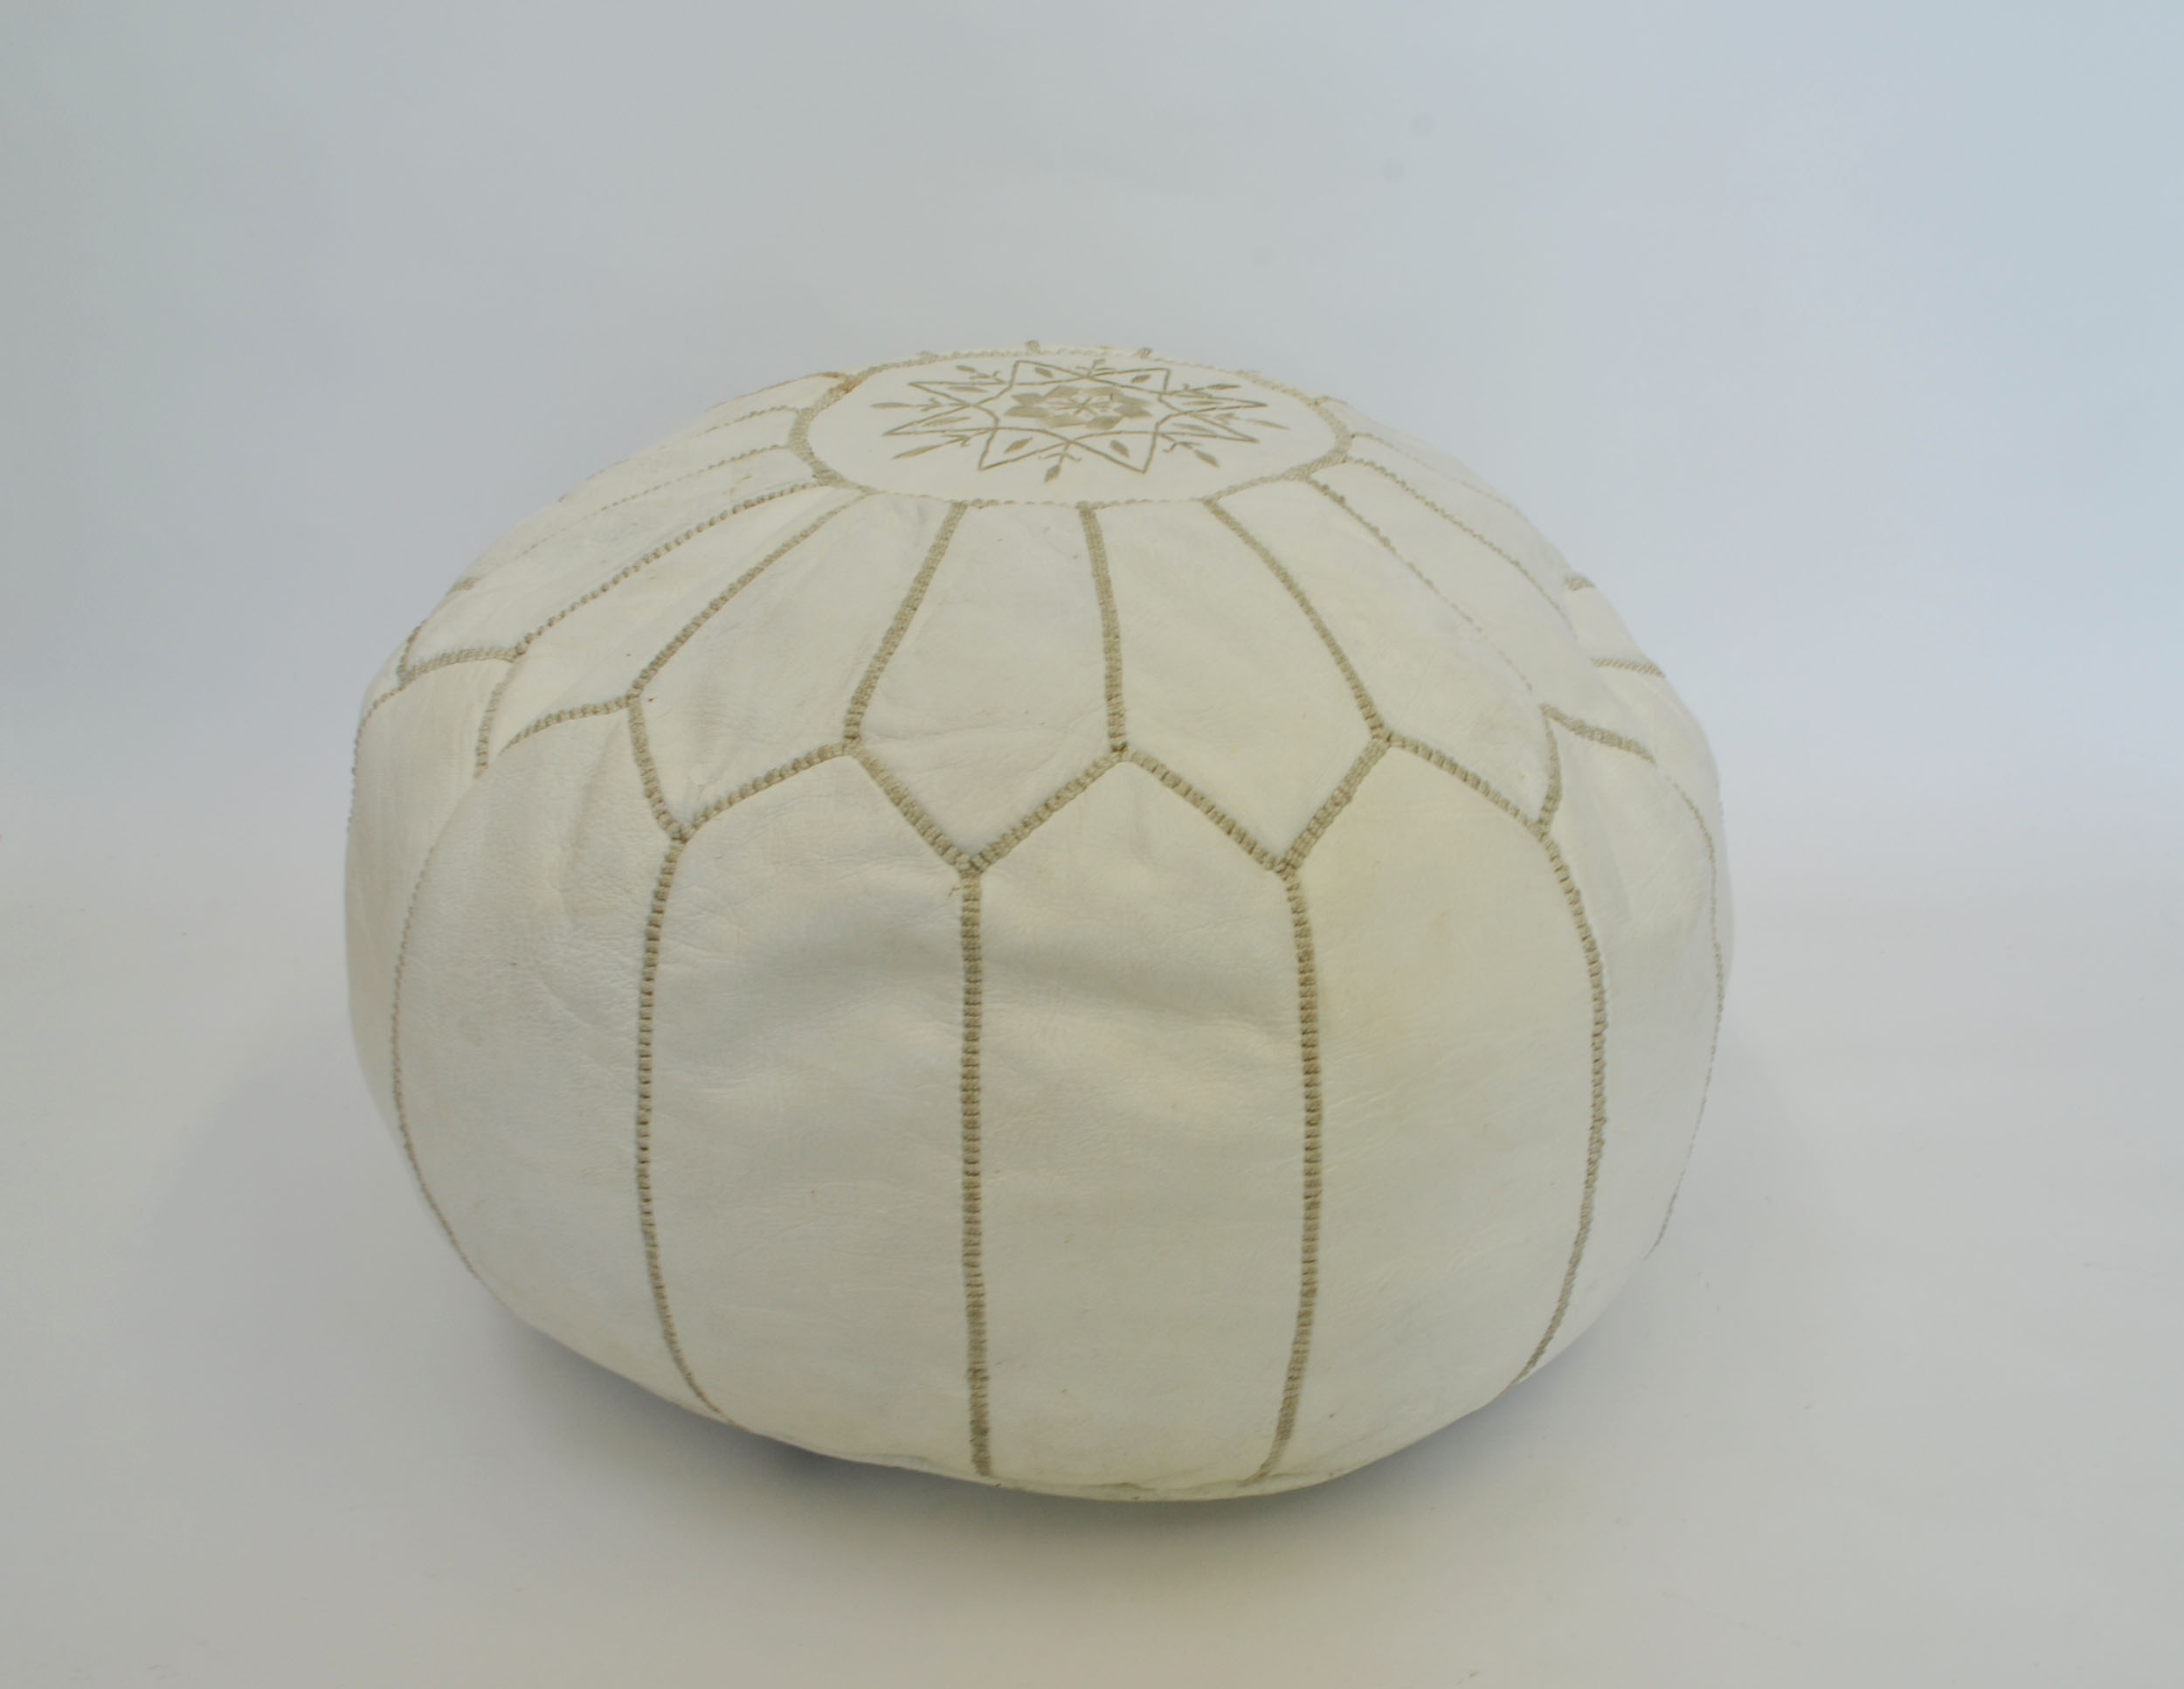 white leather POUF   QUANTITY: 1  PRICE: $25.00